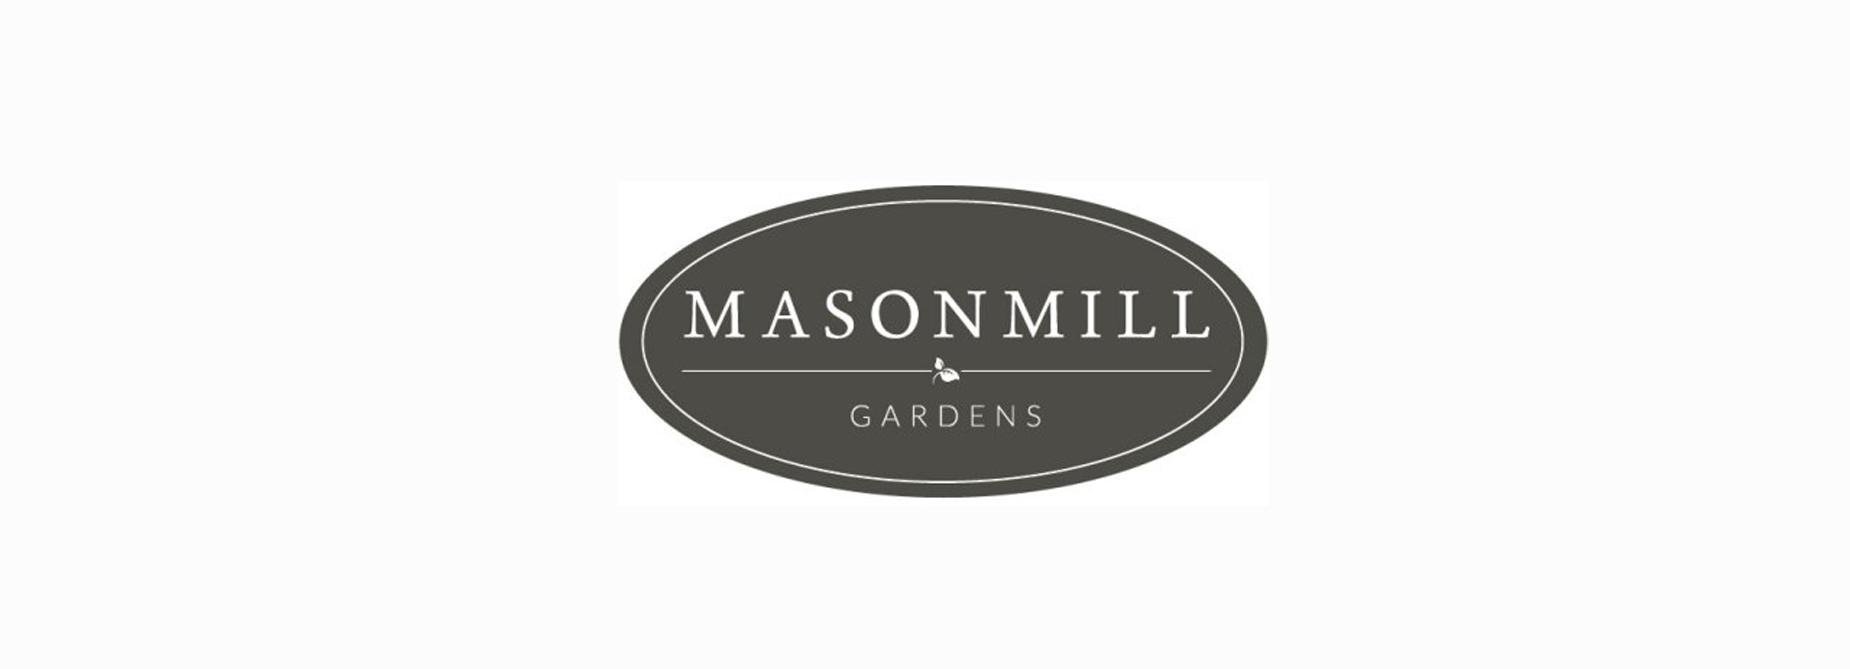 Mason Mill Gardens Logo